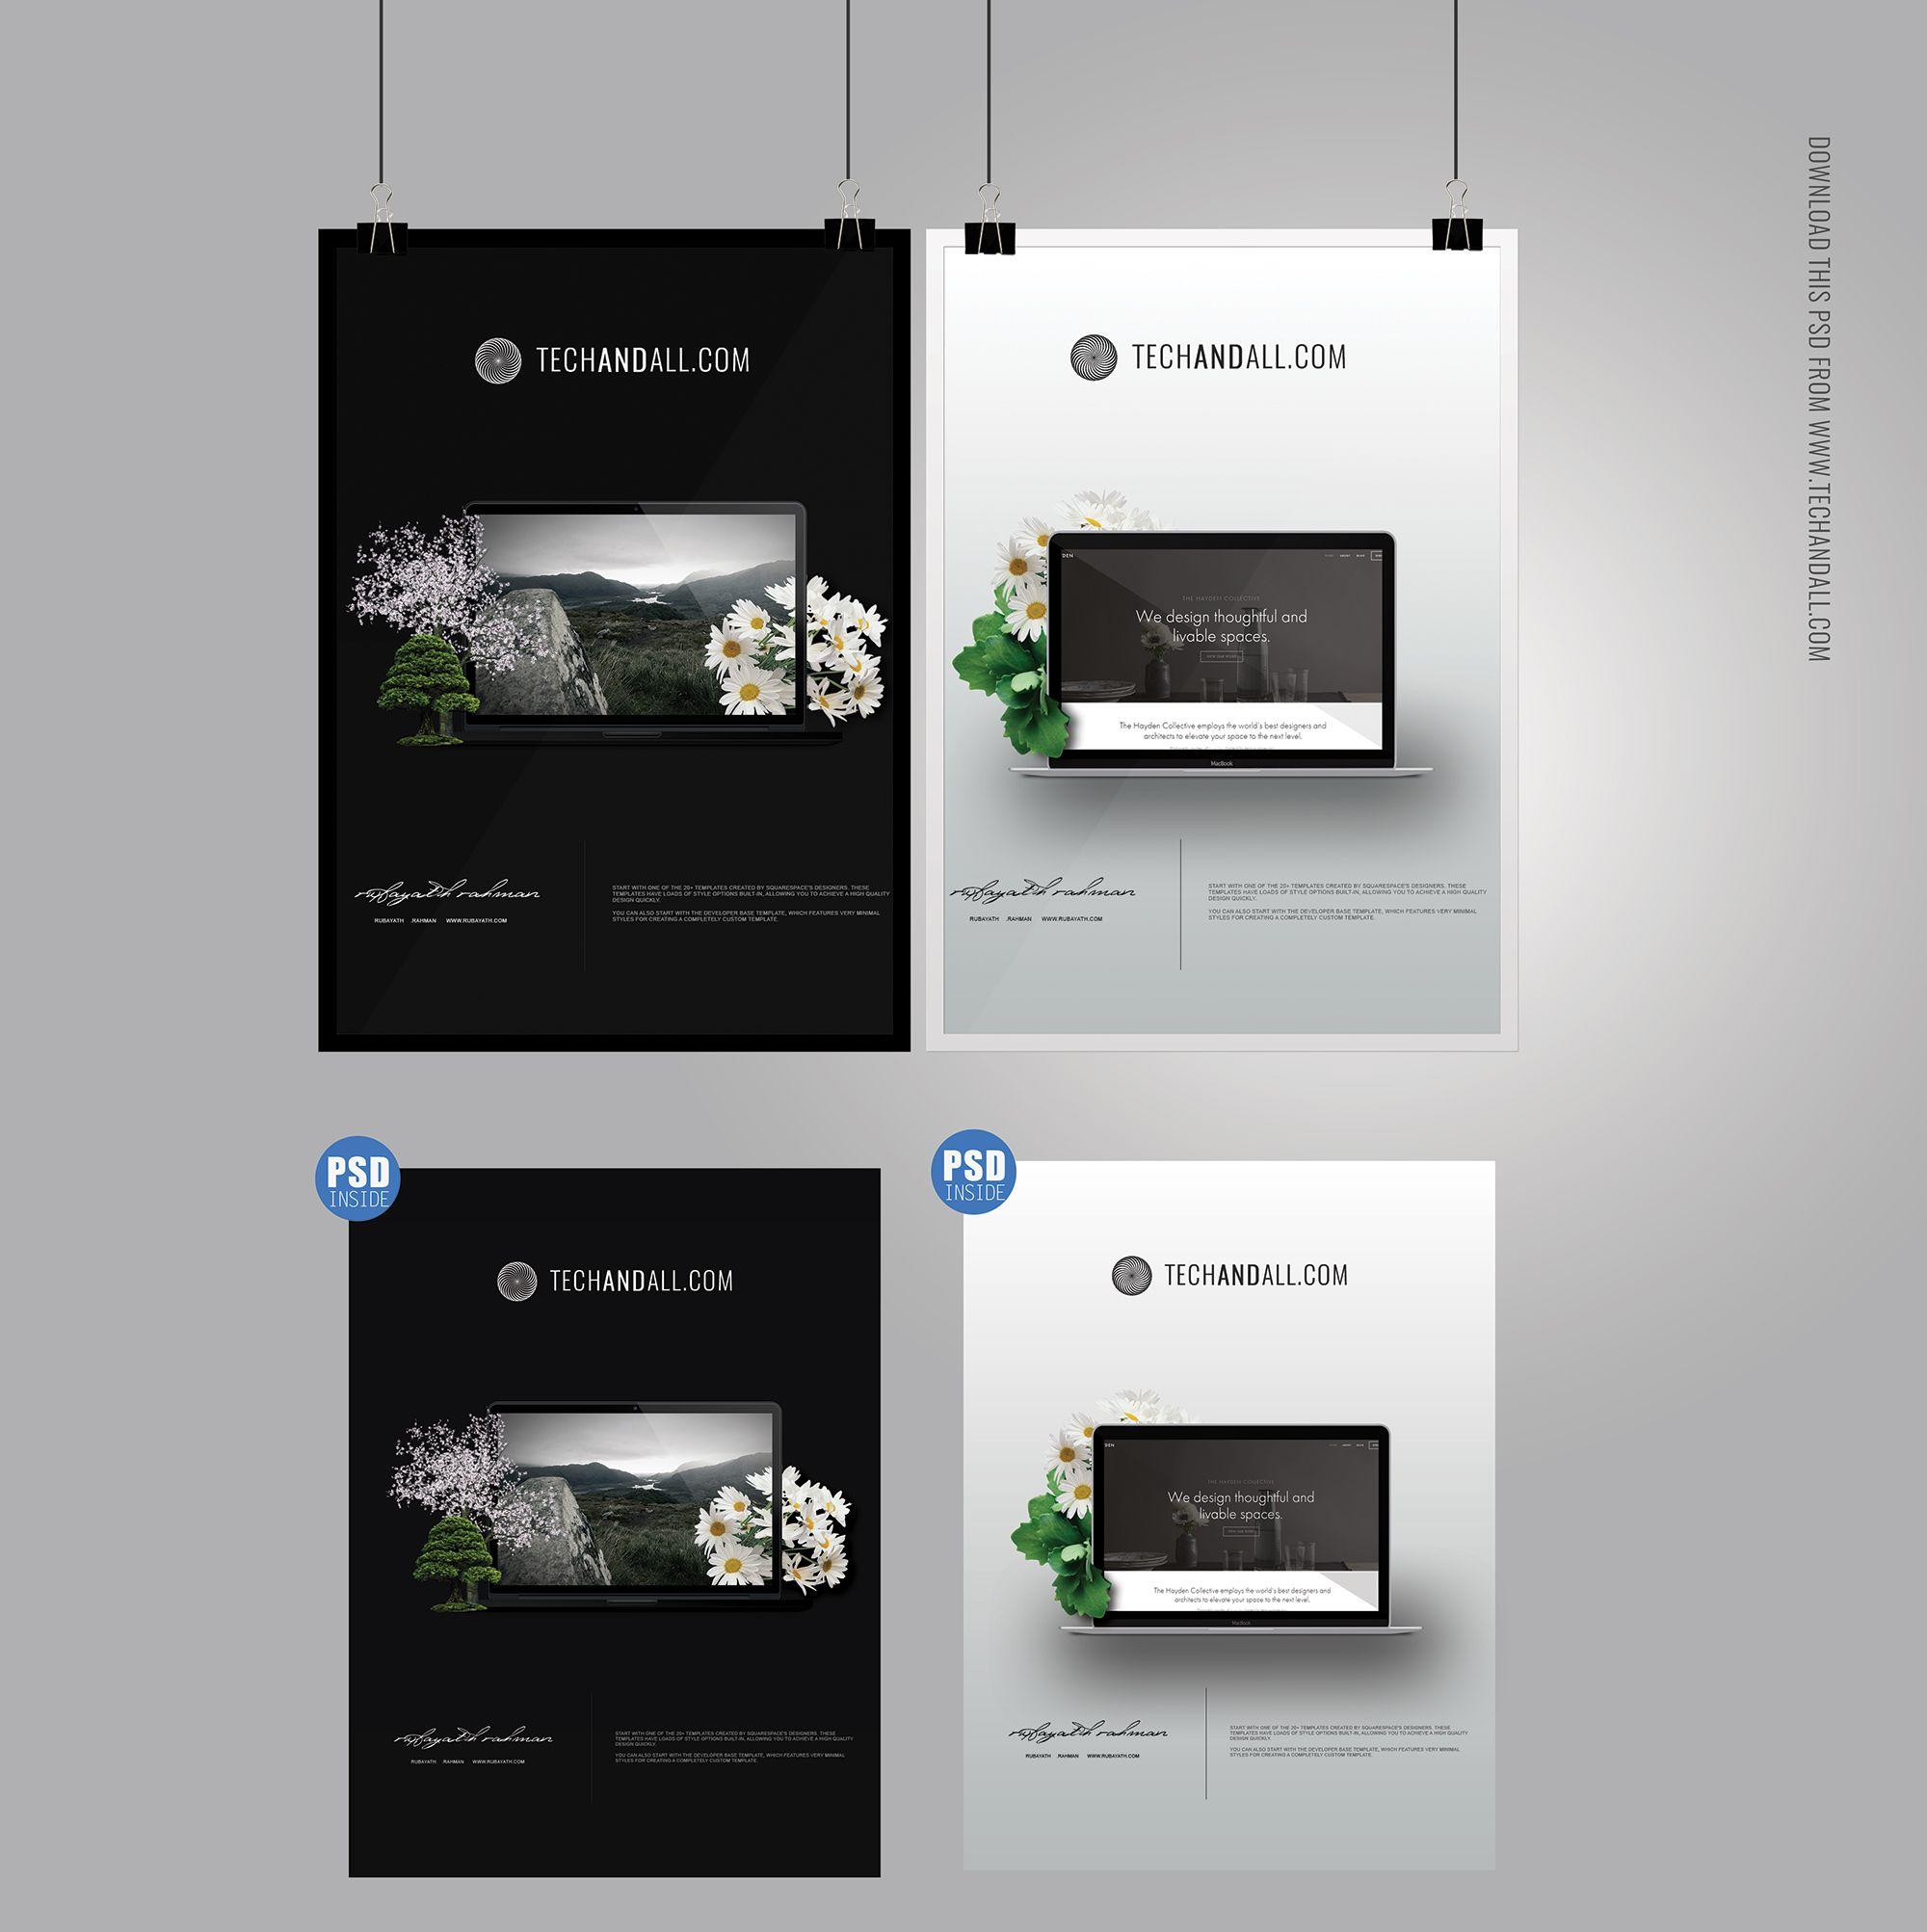 Free poster designs - Free A4 Poster Frame Mockup Freebies A4 Display Frame Free Graphic Design Mockup Poster Presentation